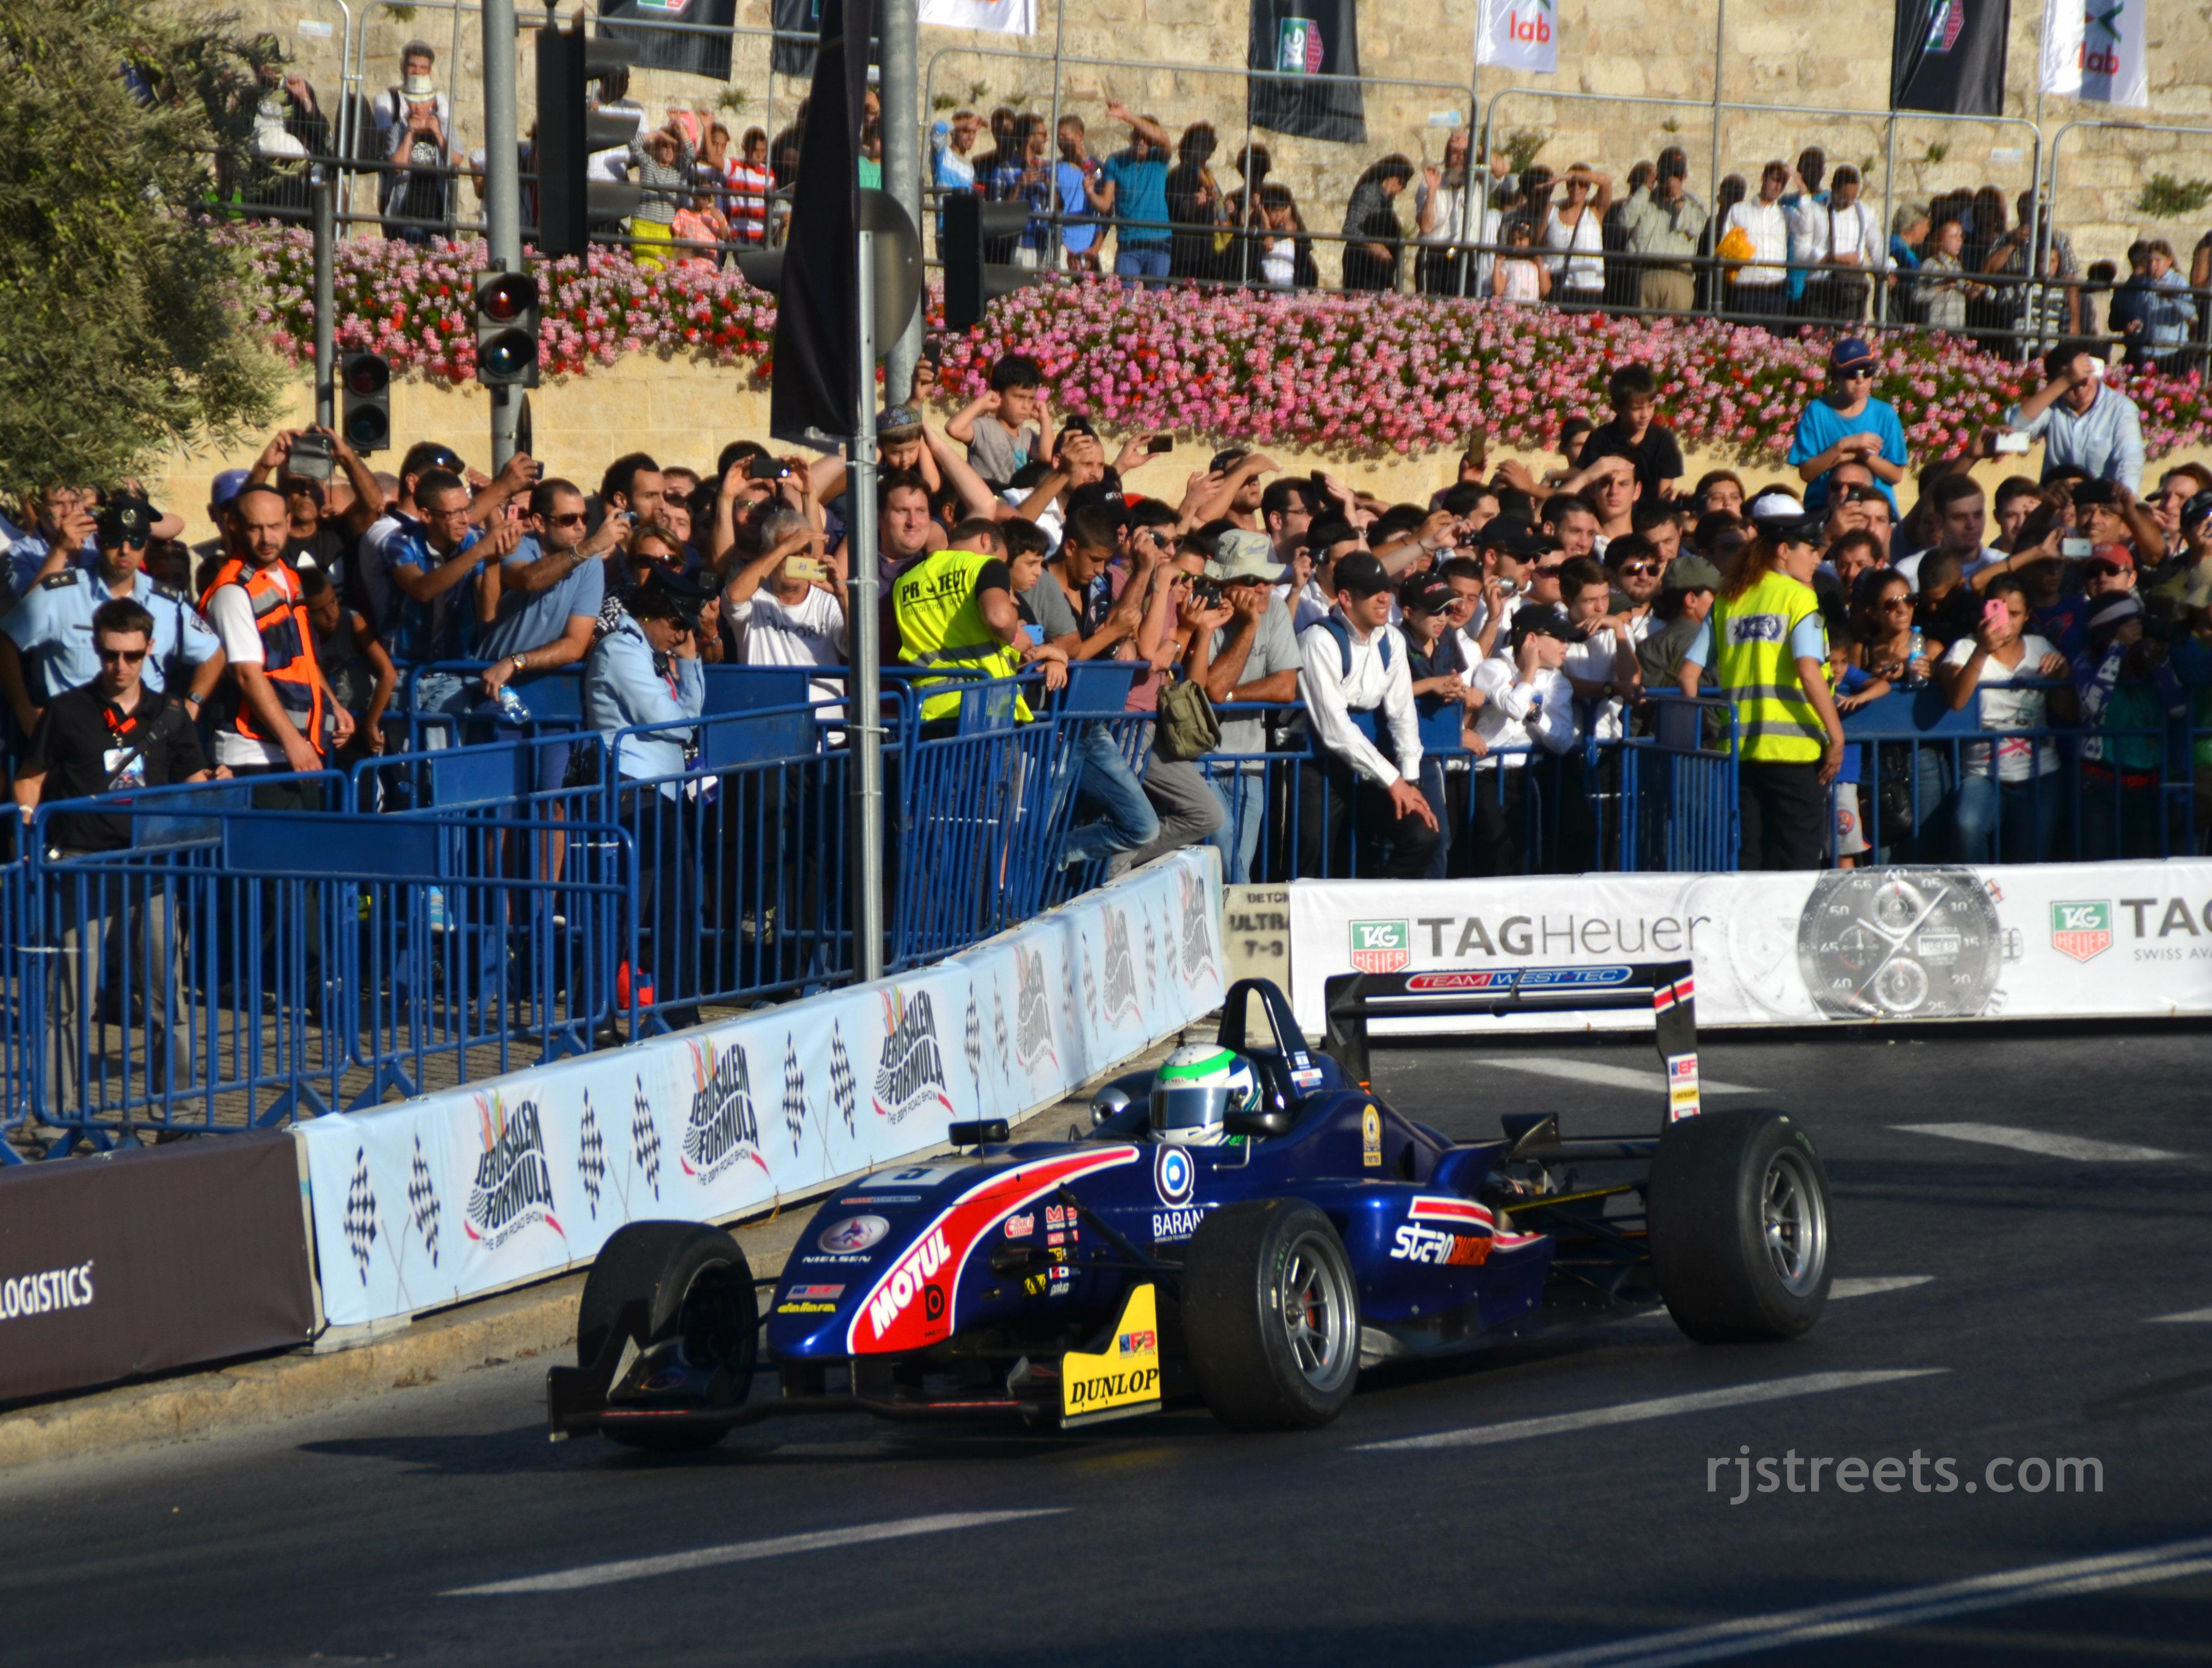 image Jerusalem formula car